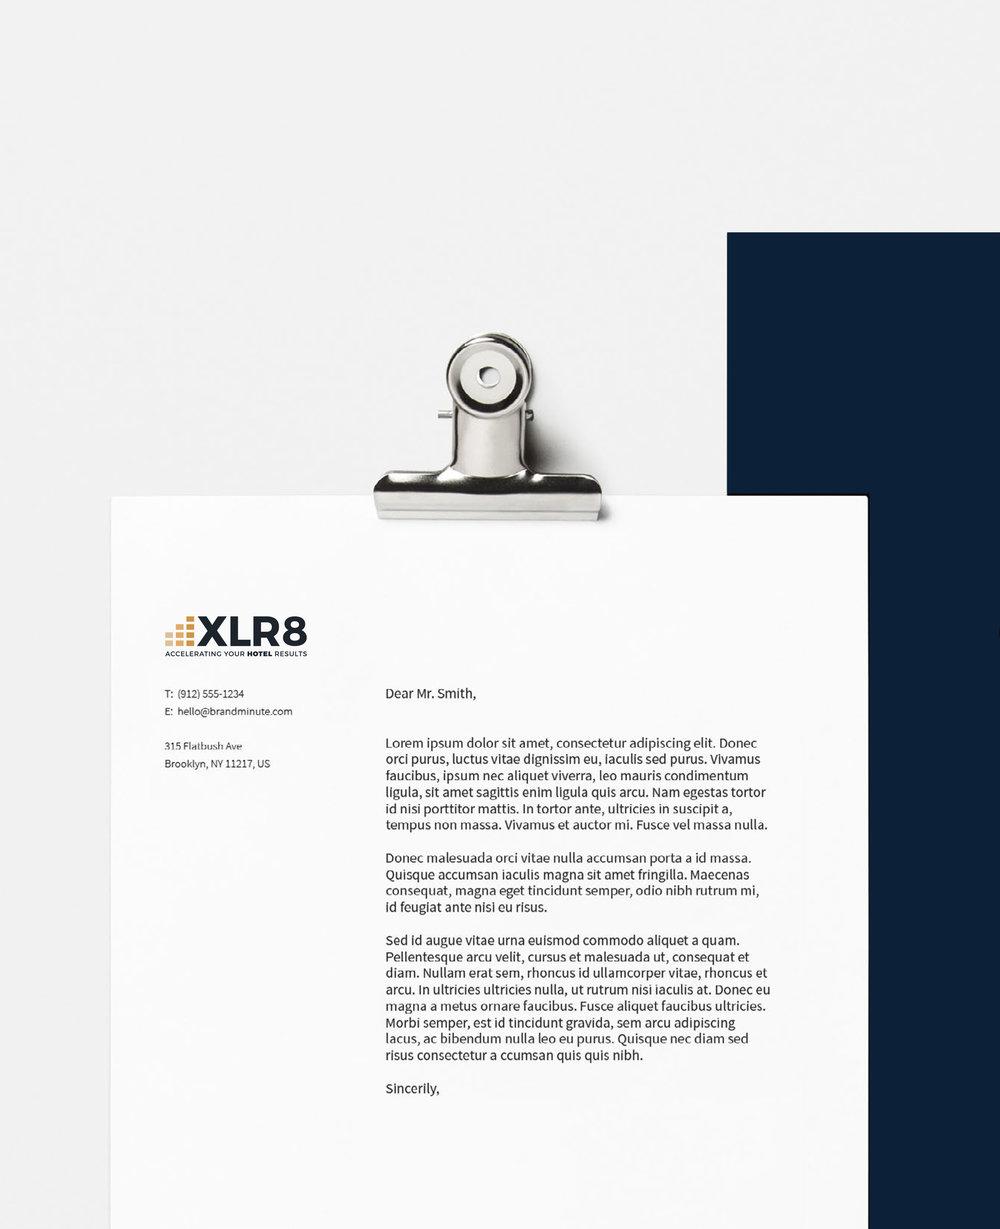 XLR8-revenue-management-business-entrepreneur.jpg